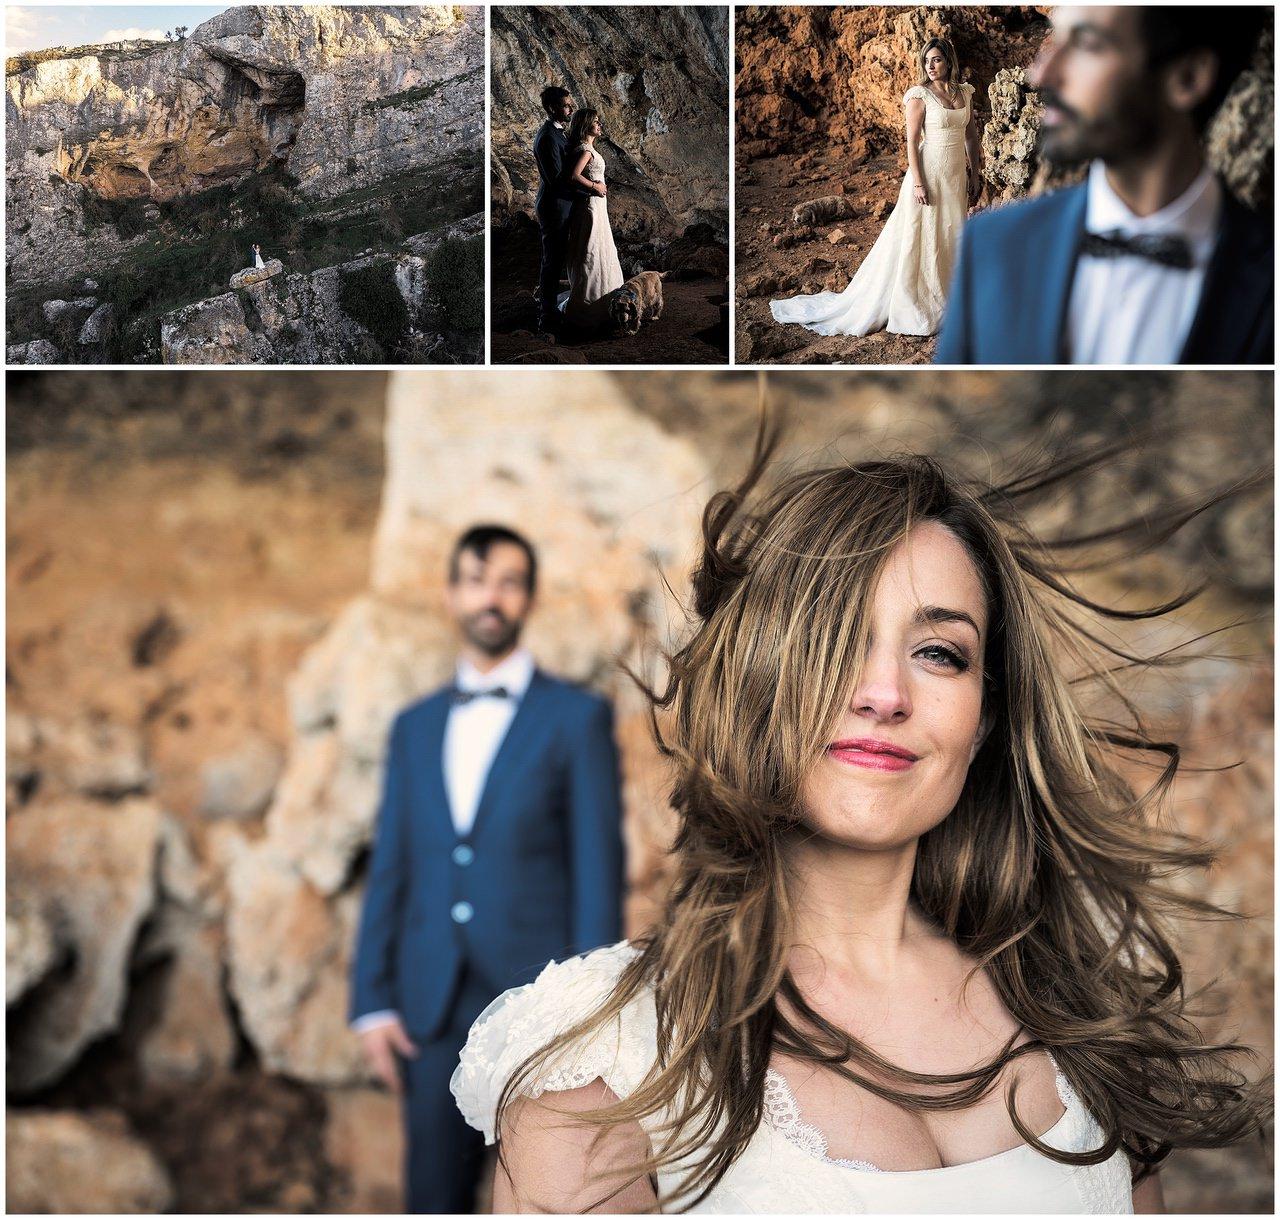 fotografo bodas alcoy noe ramon 2